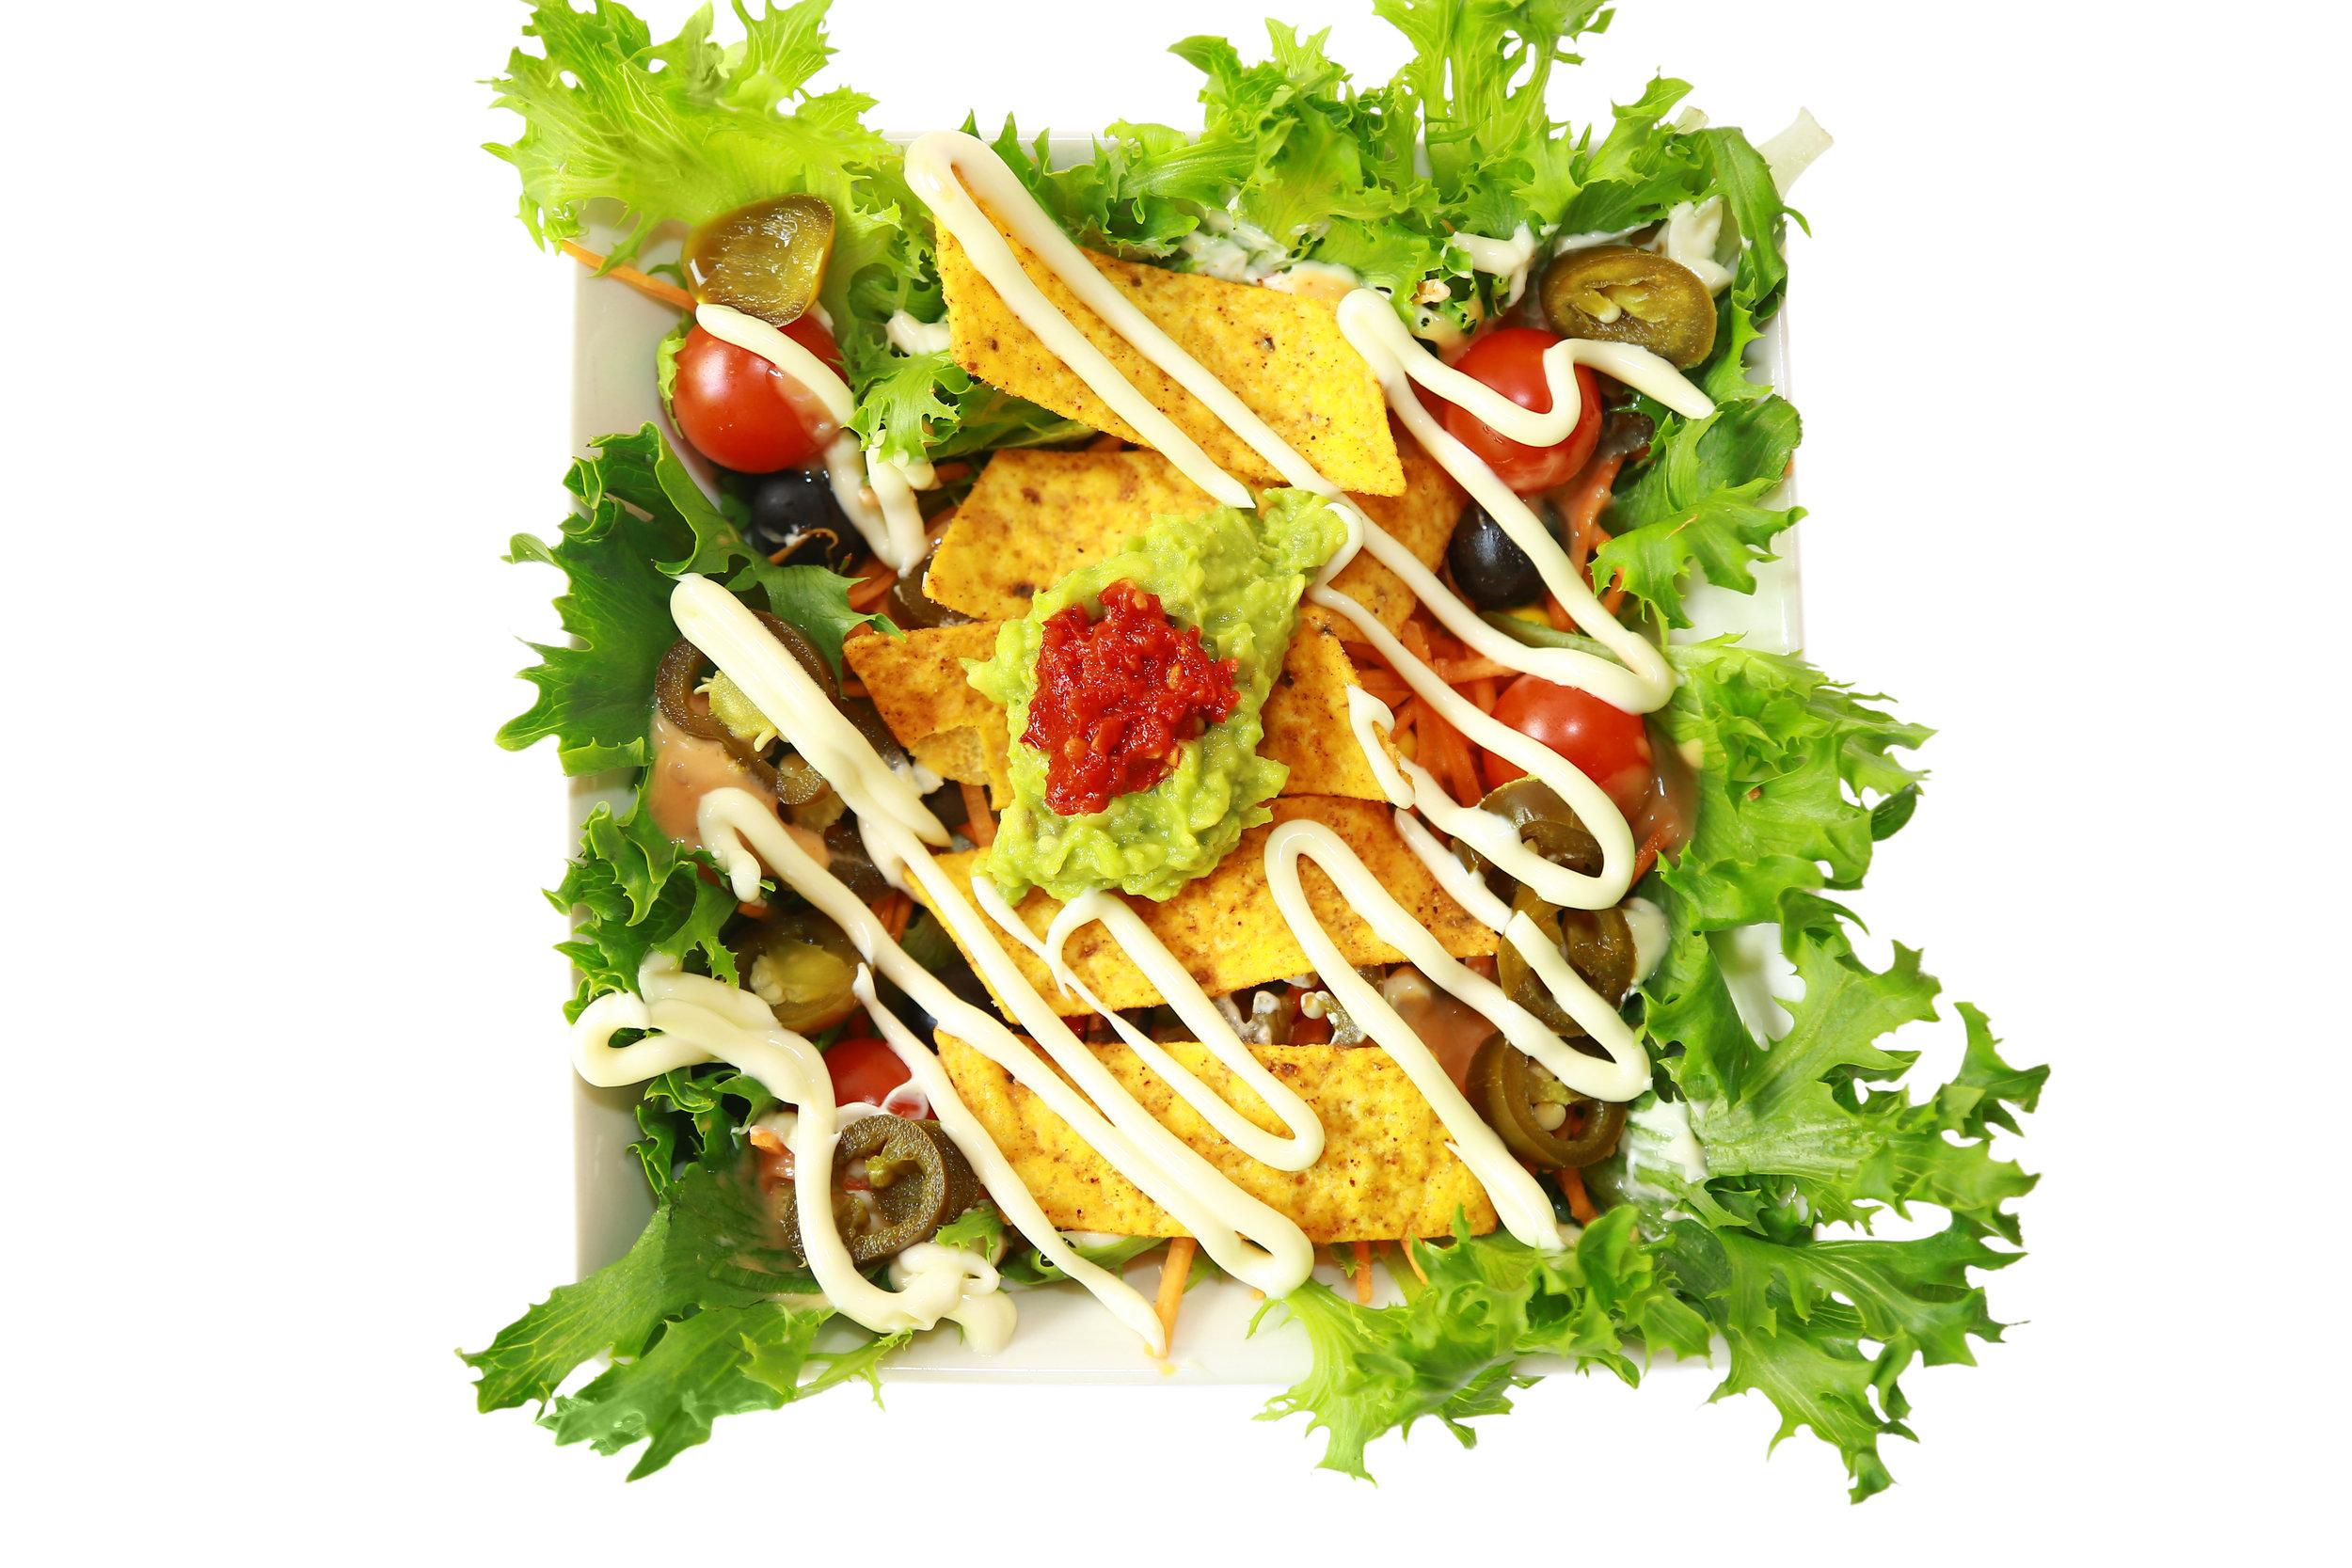 Mexikhana Chipotle - Salads with Nachos-Guacamole-salsa.JPG